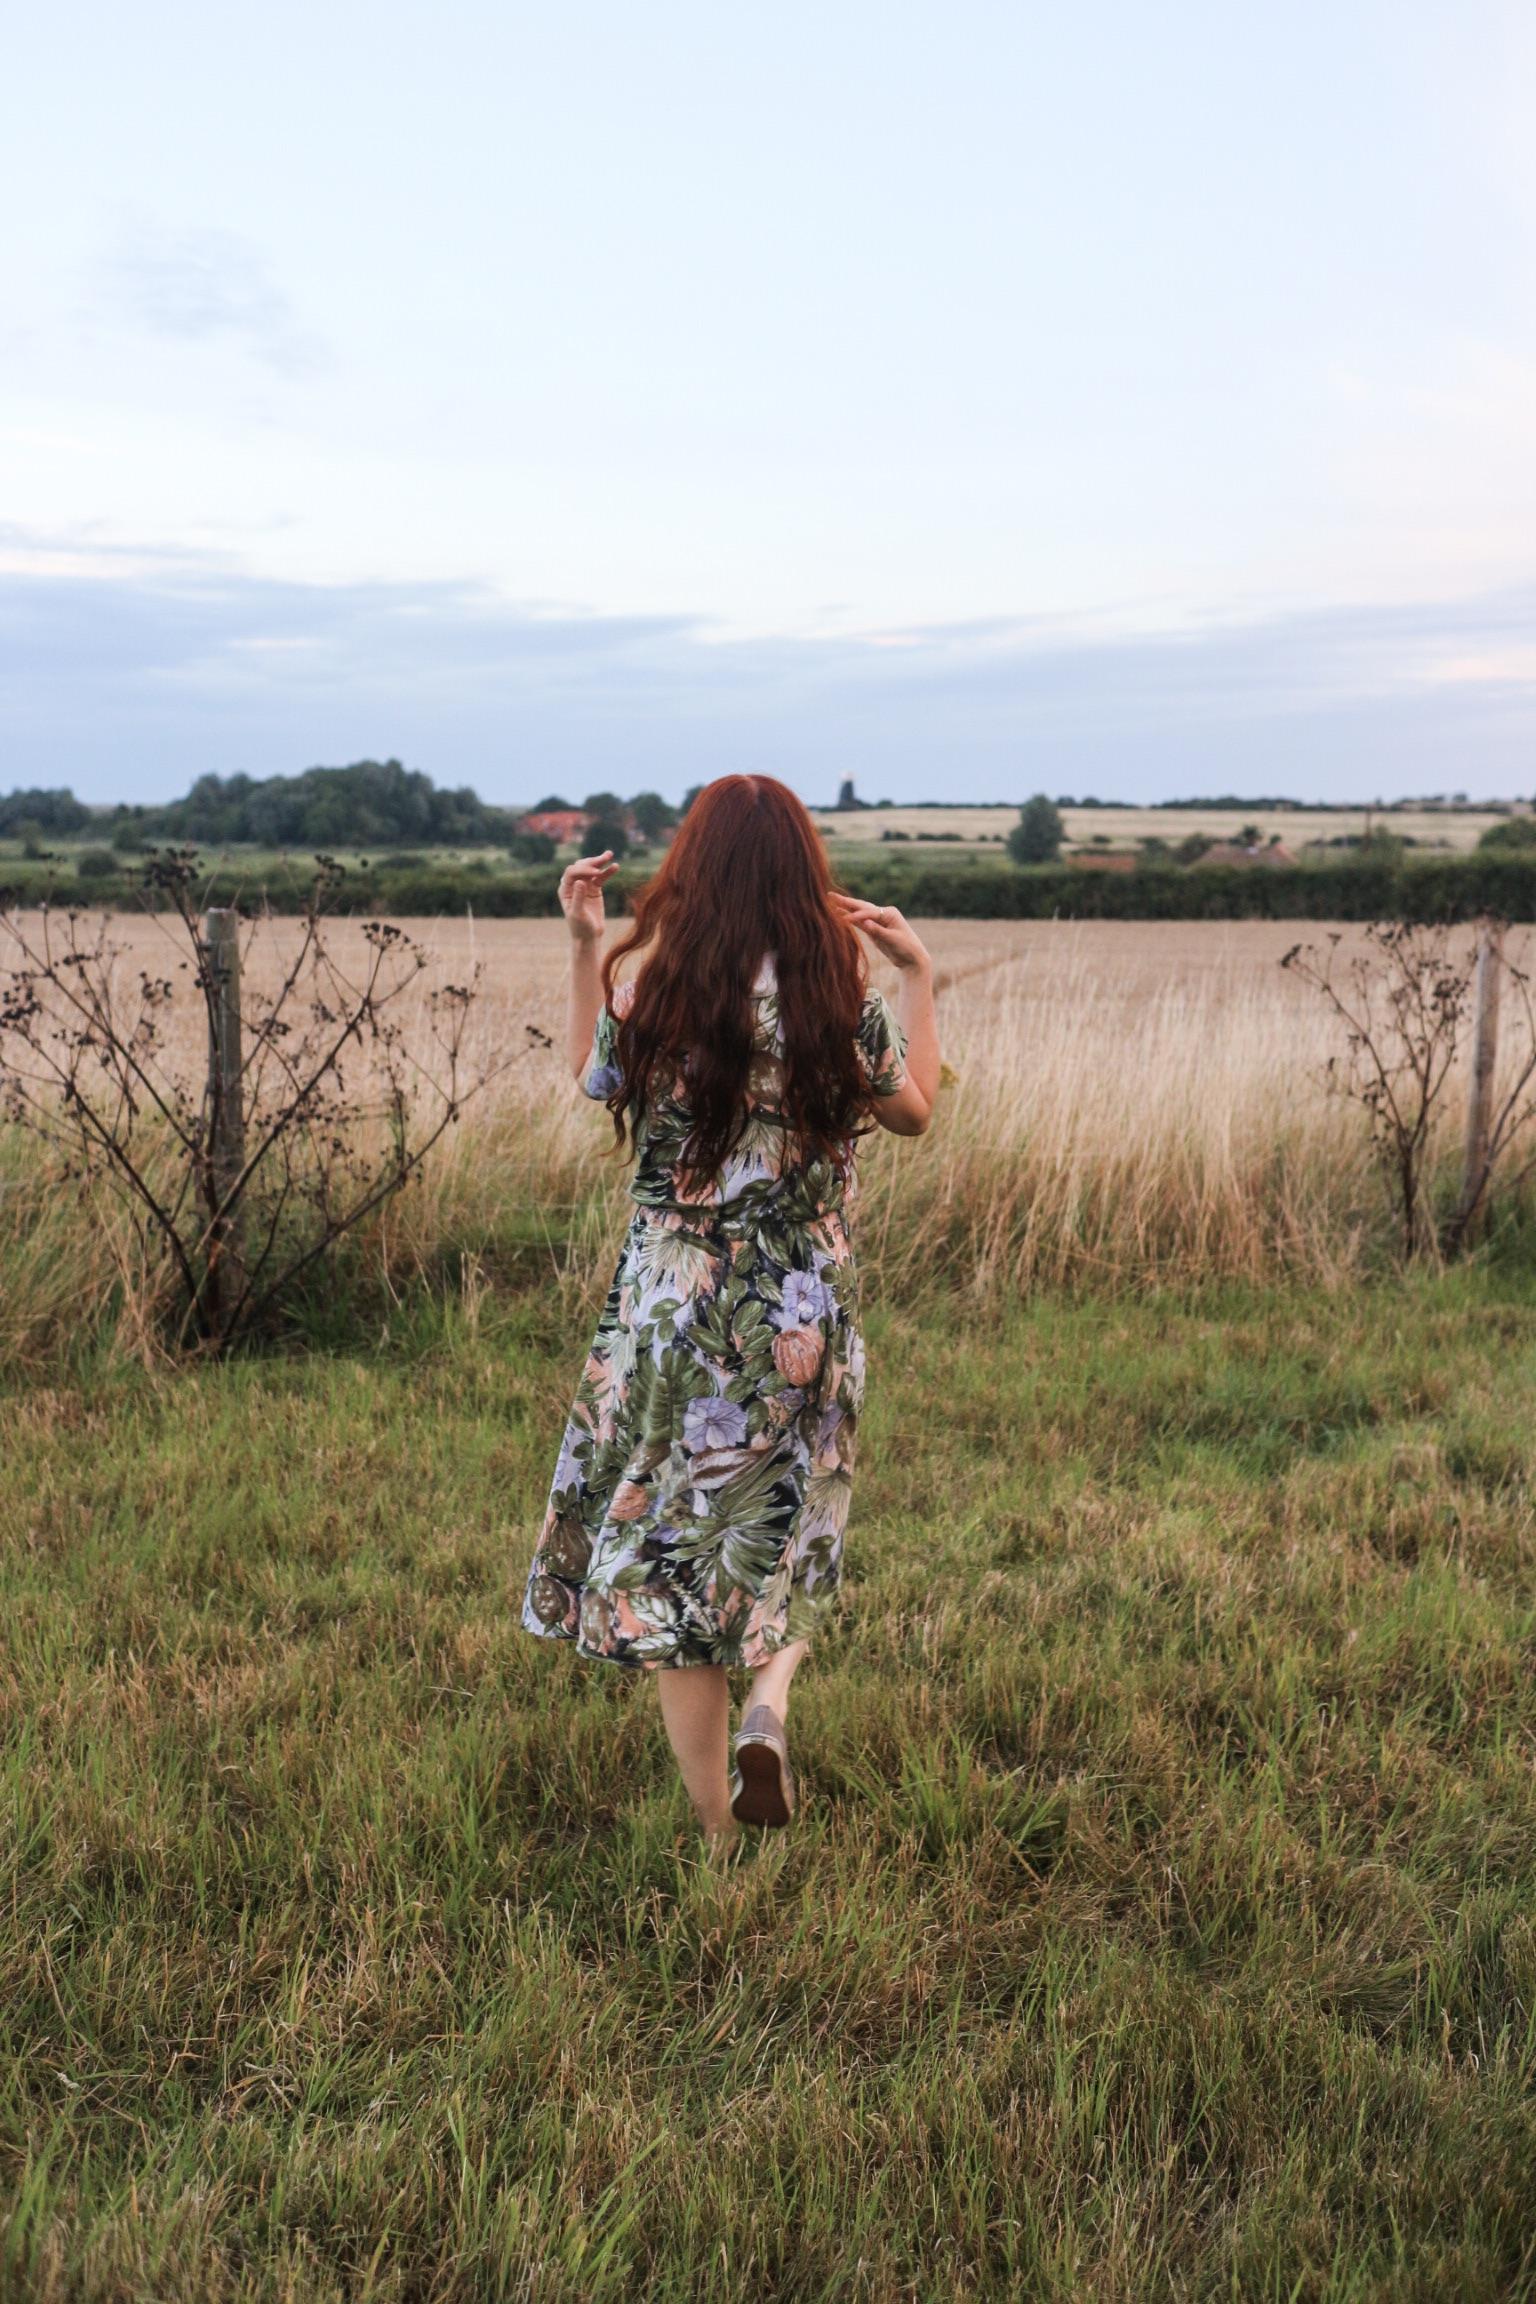 Girl running in meadow